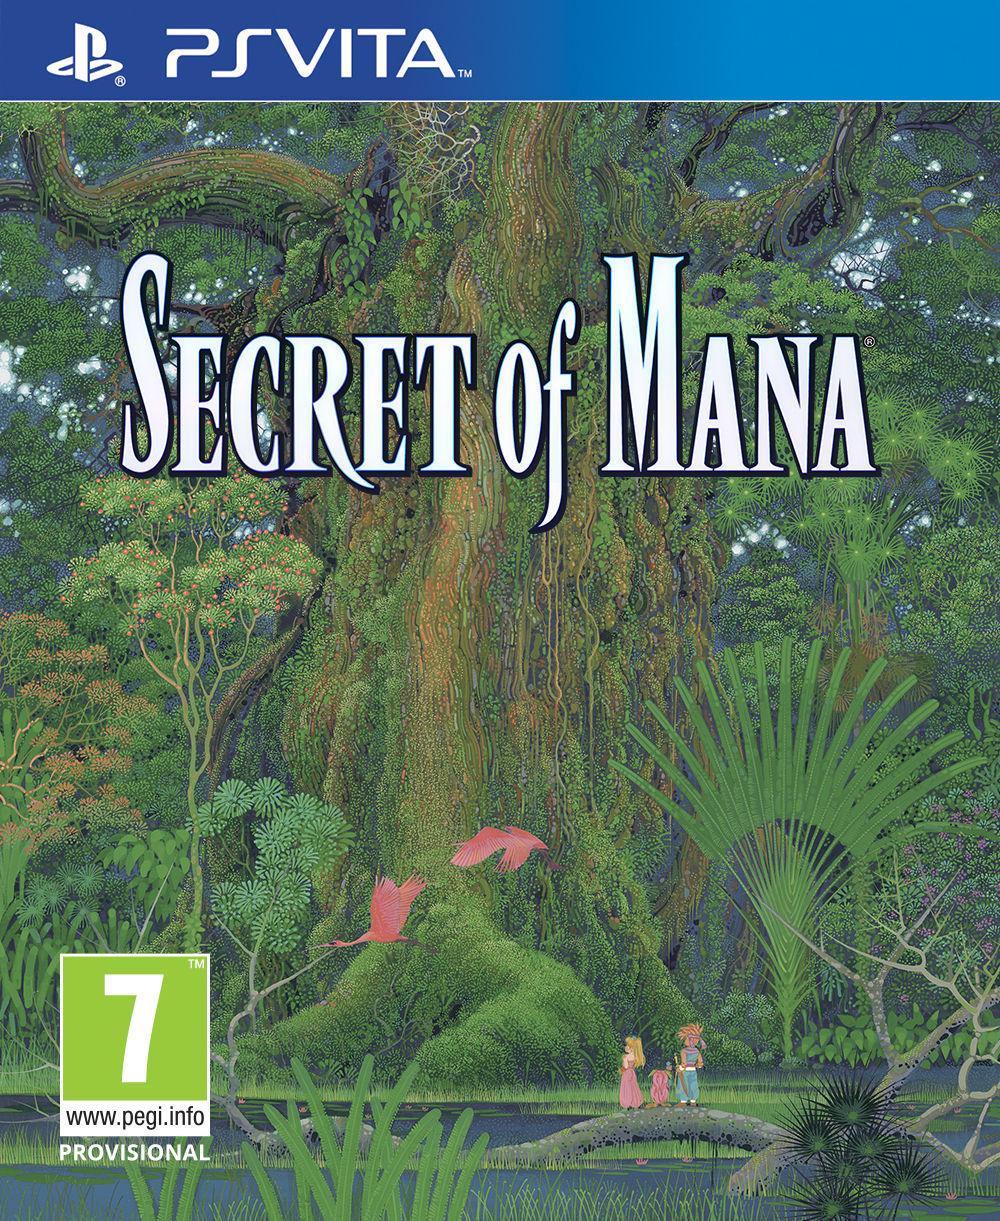 Imagen 9 de Secret of Mana para PSVITA